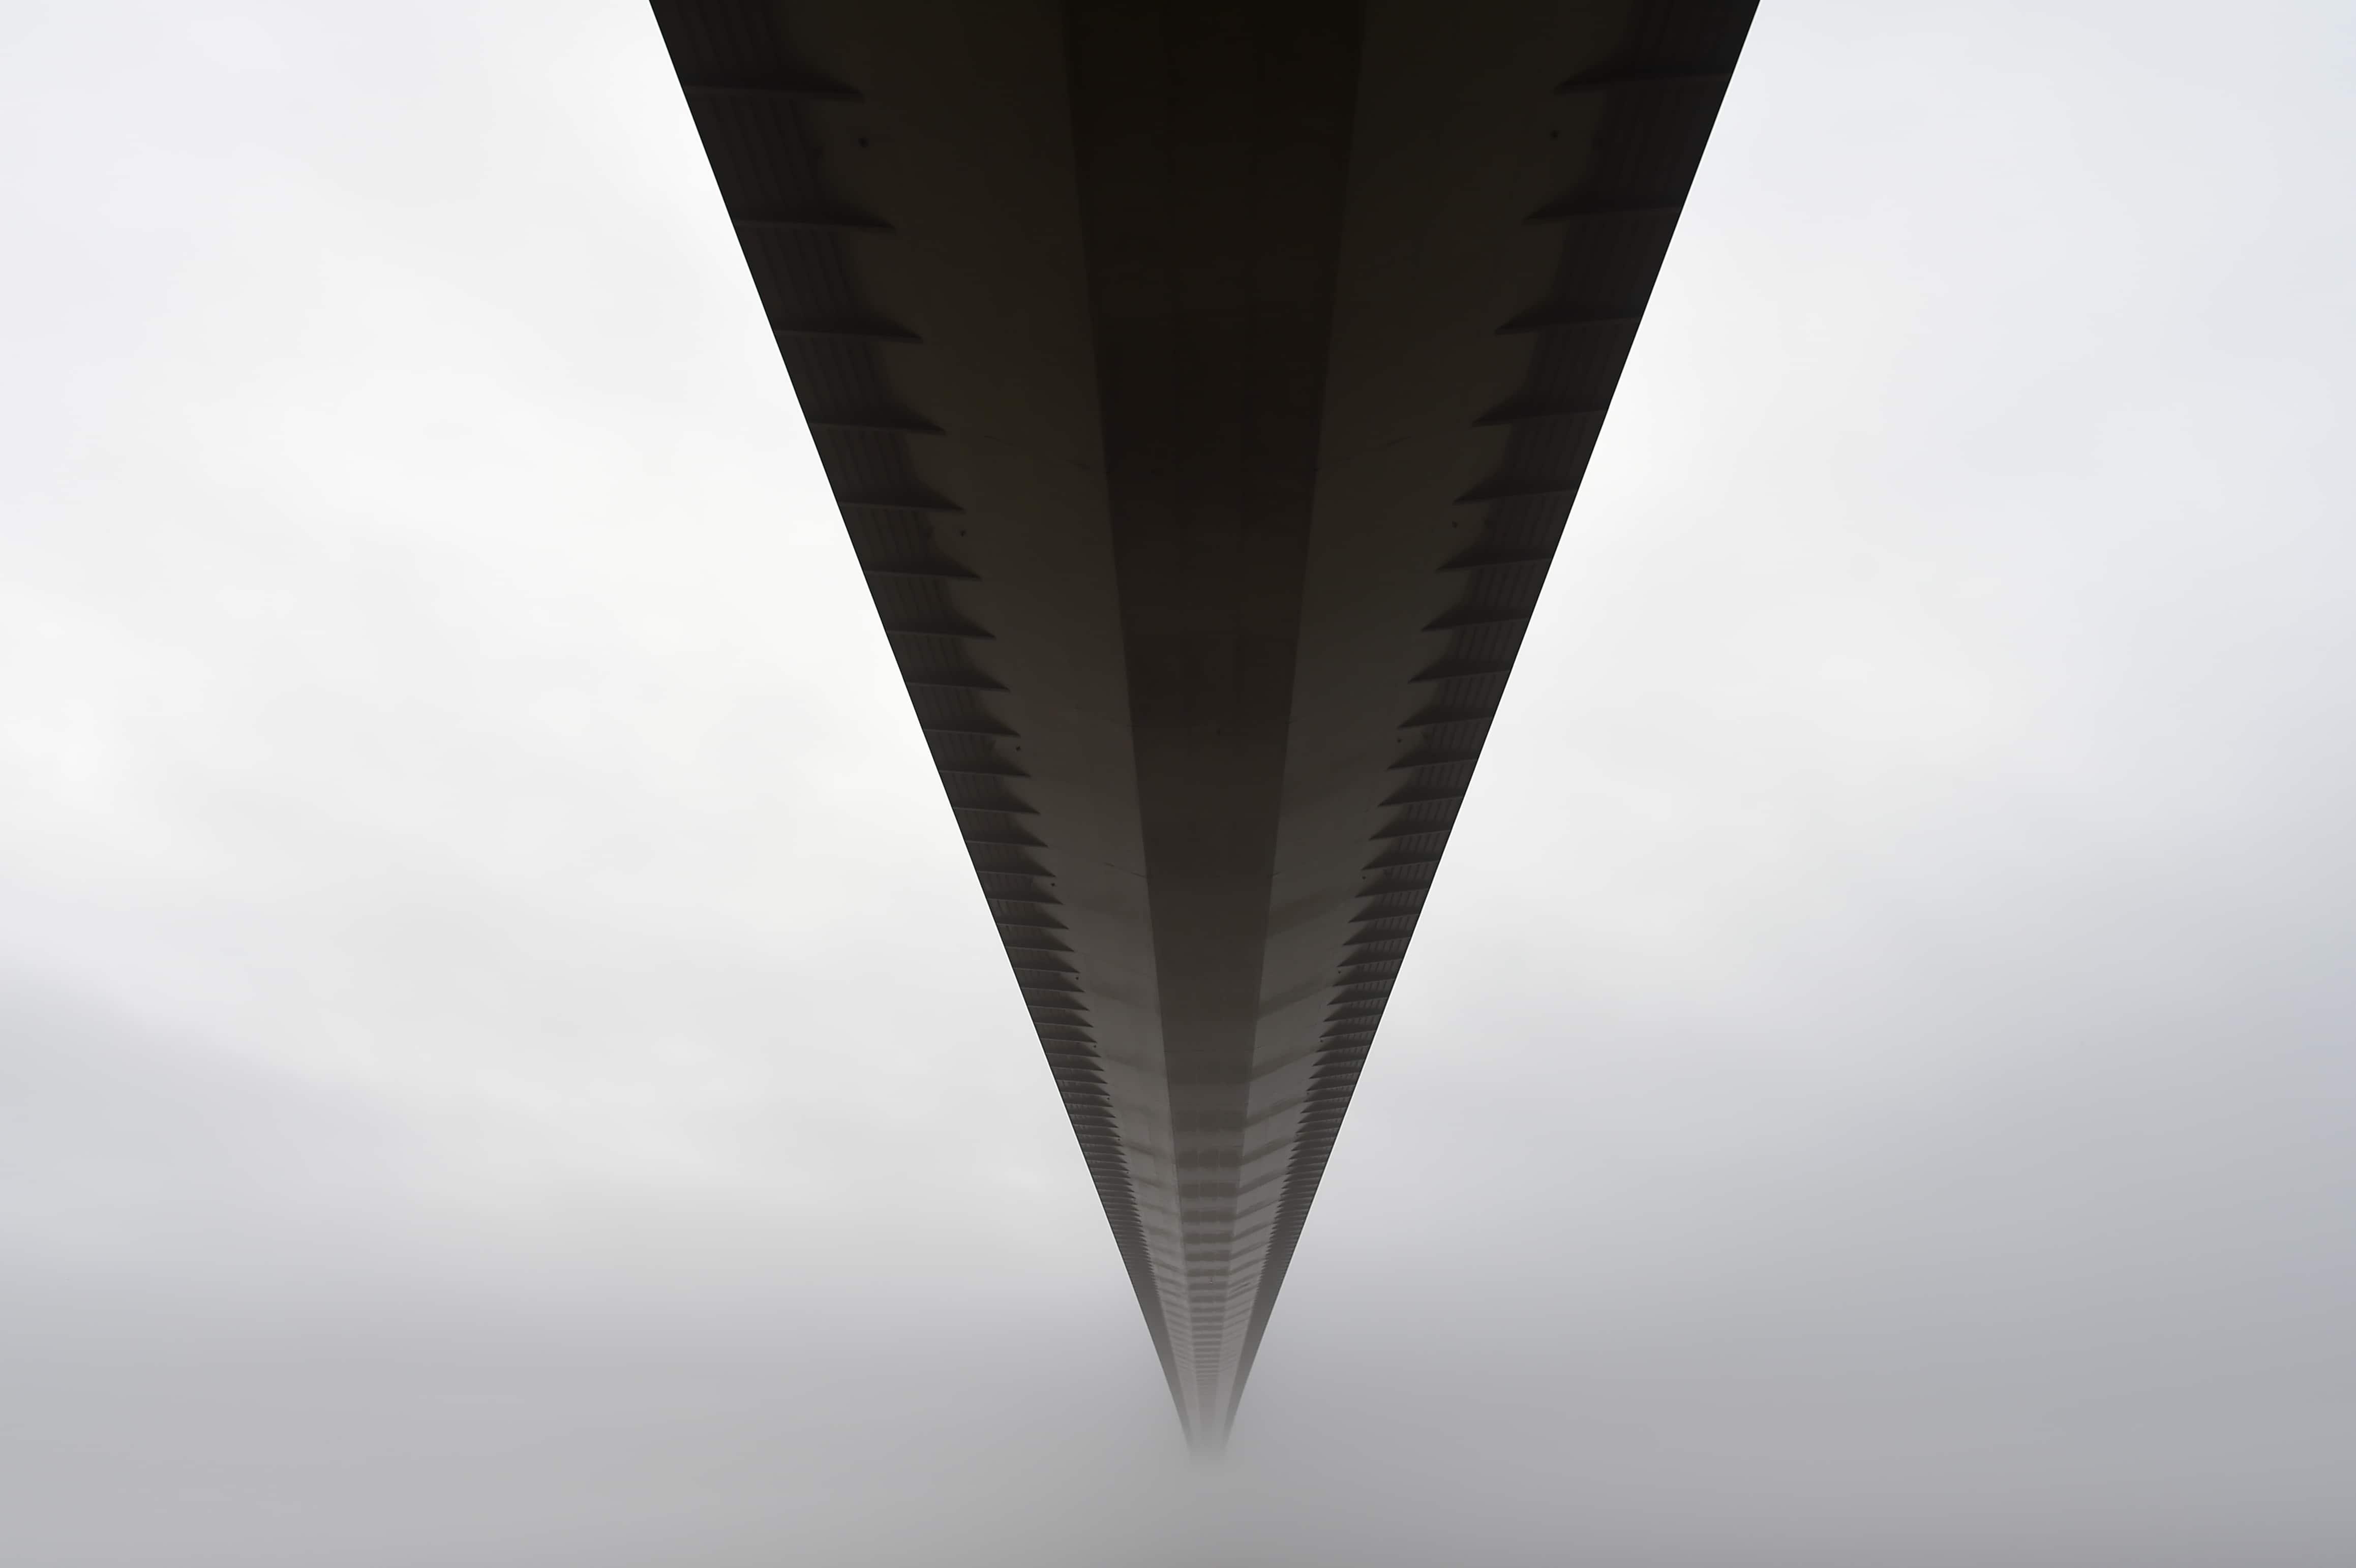 Le nuvole avvolgono l'Humber bridge, nel nord-est dell'Inghilterra. Credit: AFP PHOTO / PAUL ELLIS